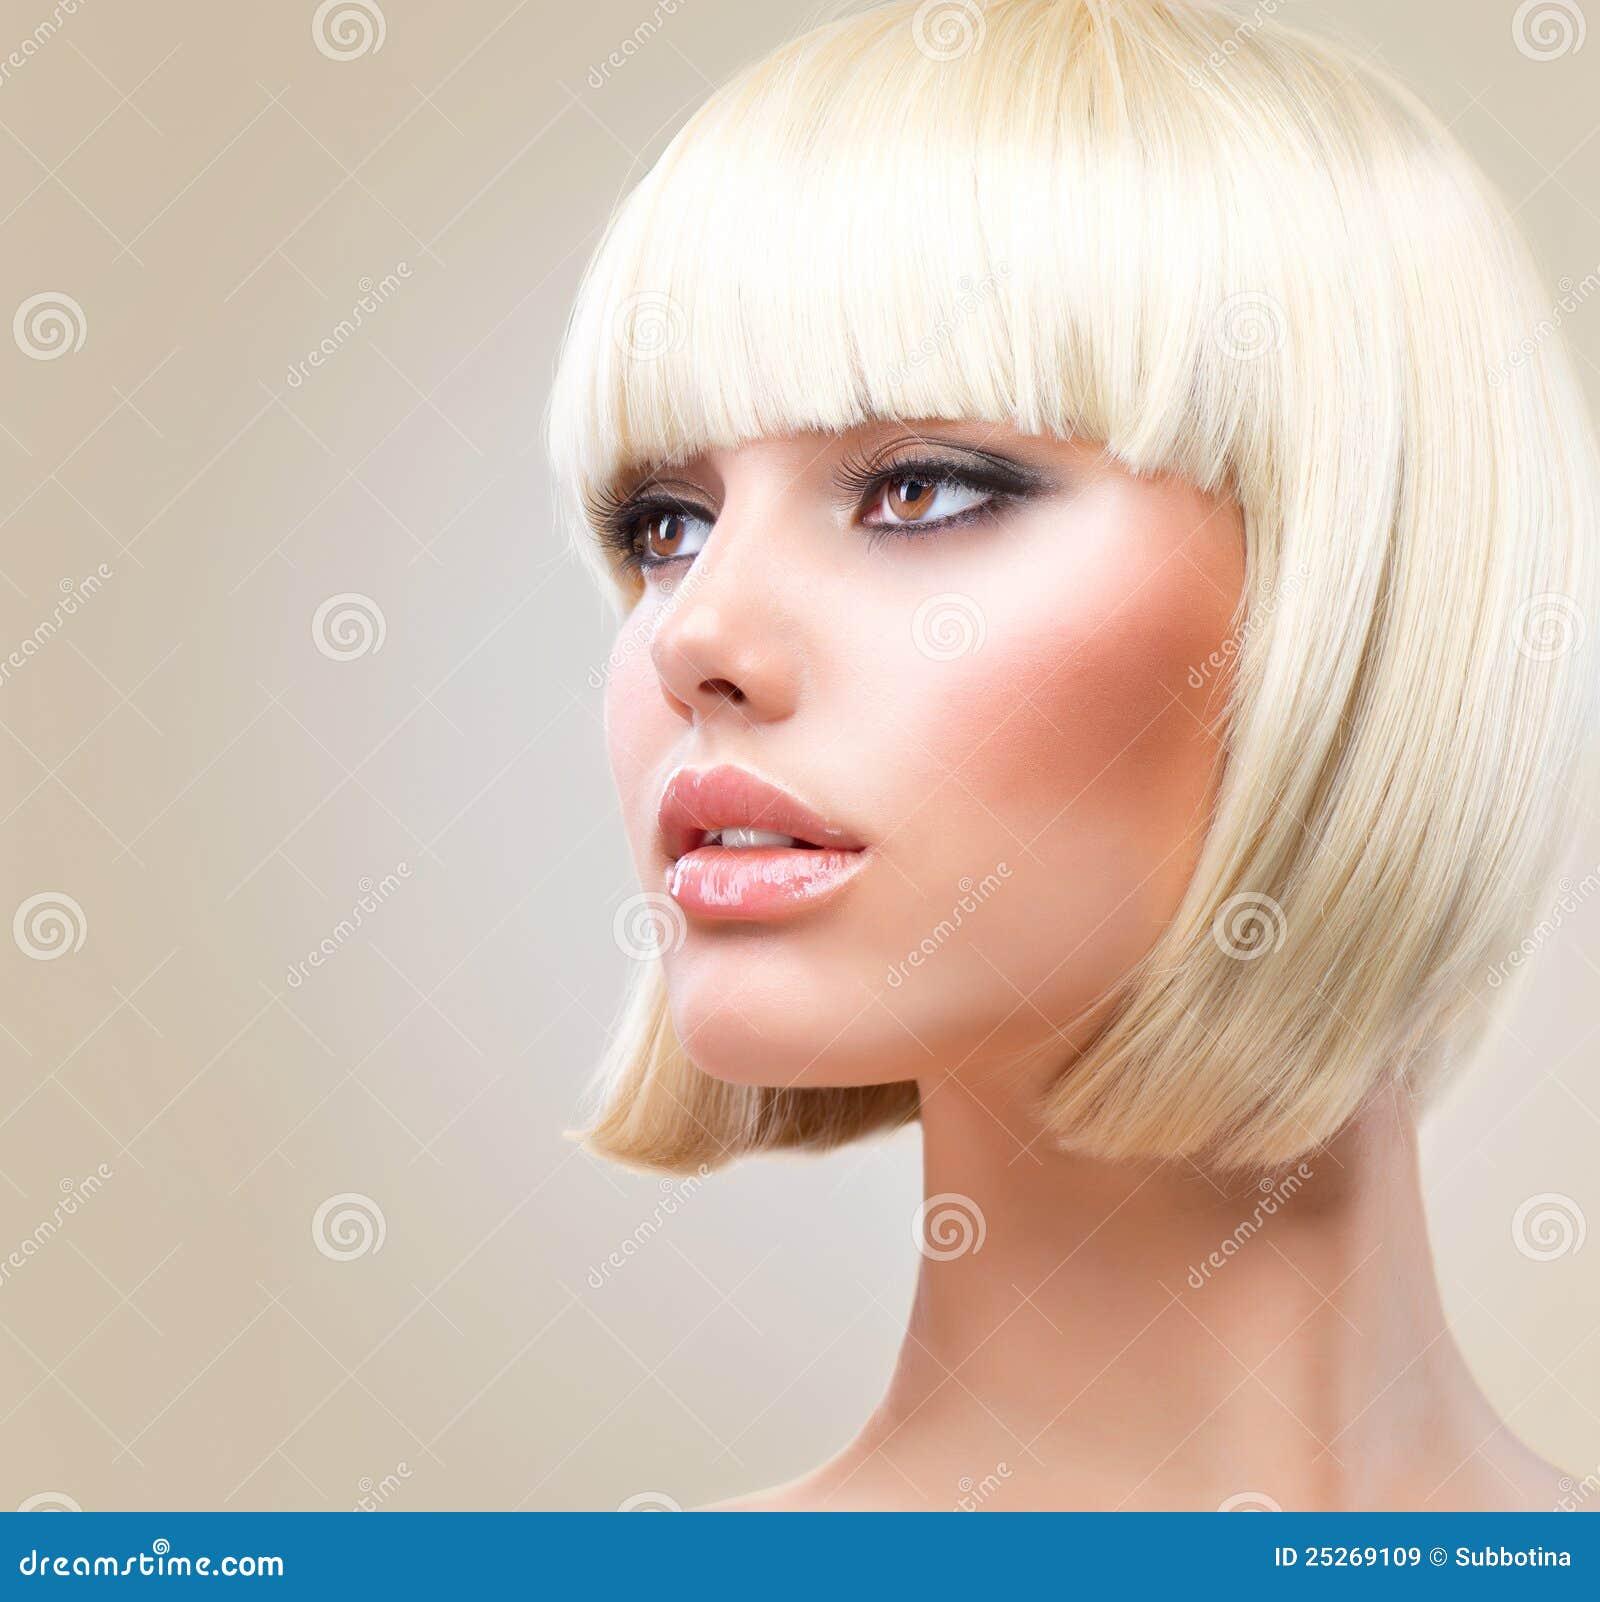 hair stock photos - photo #46